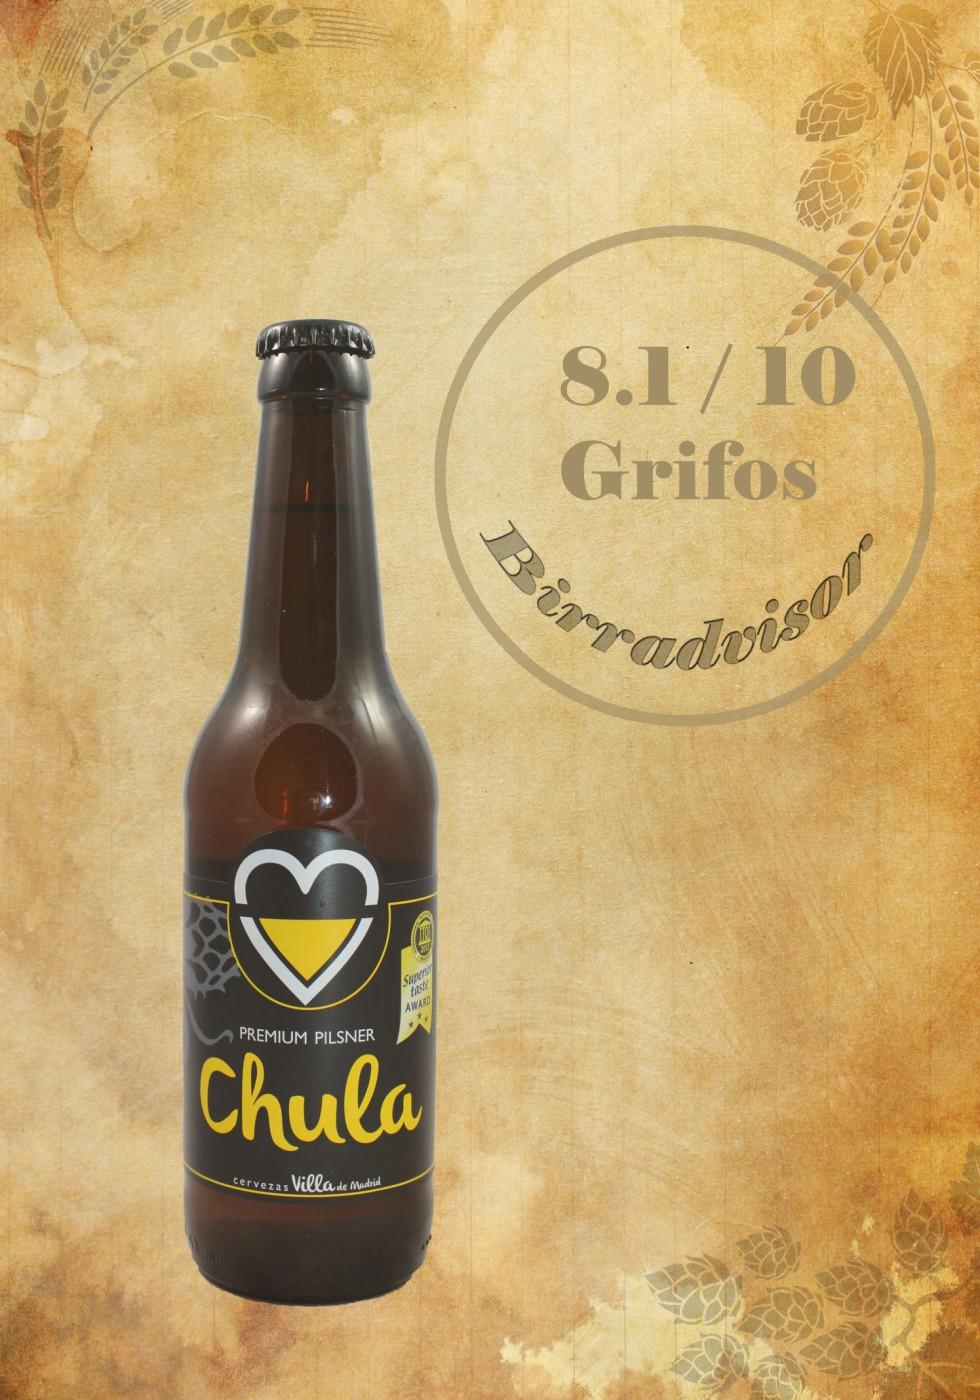 chula (pilsner).jpg